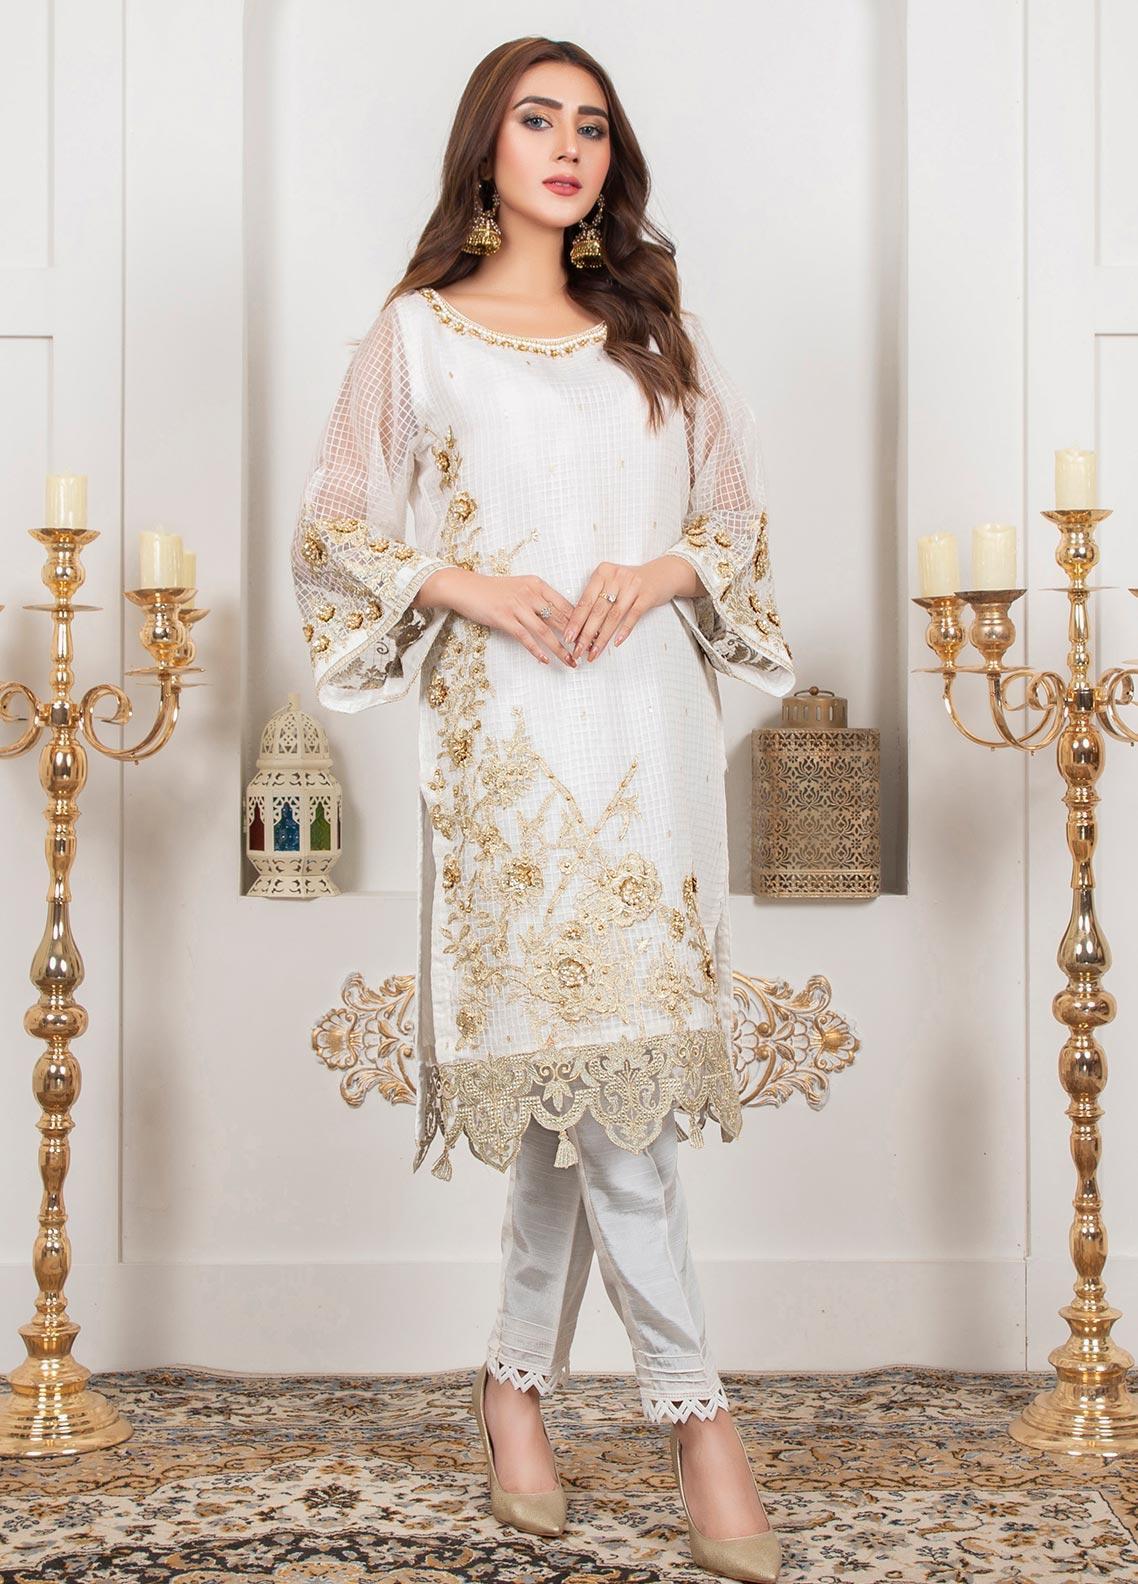 Lush Embroidered Organza Stitched Shirt 08 Chantilly Lace